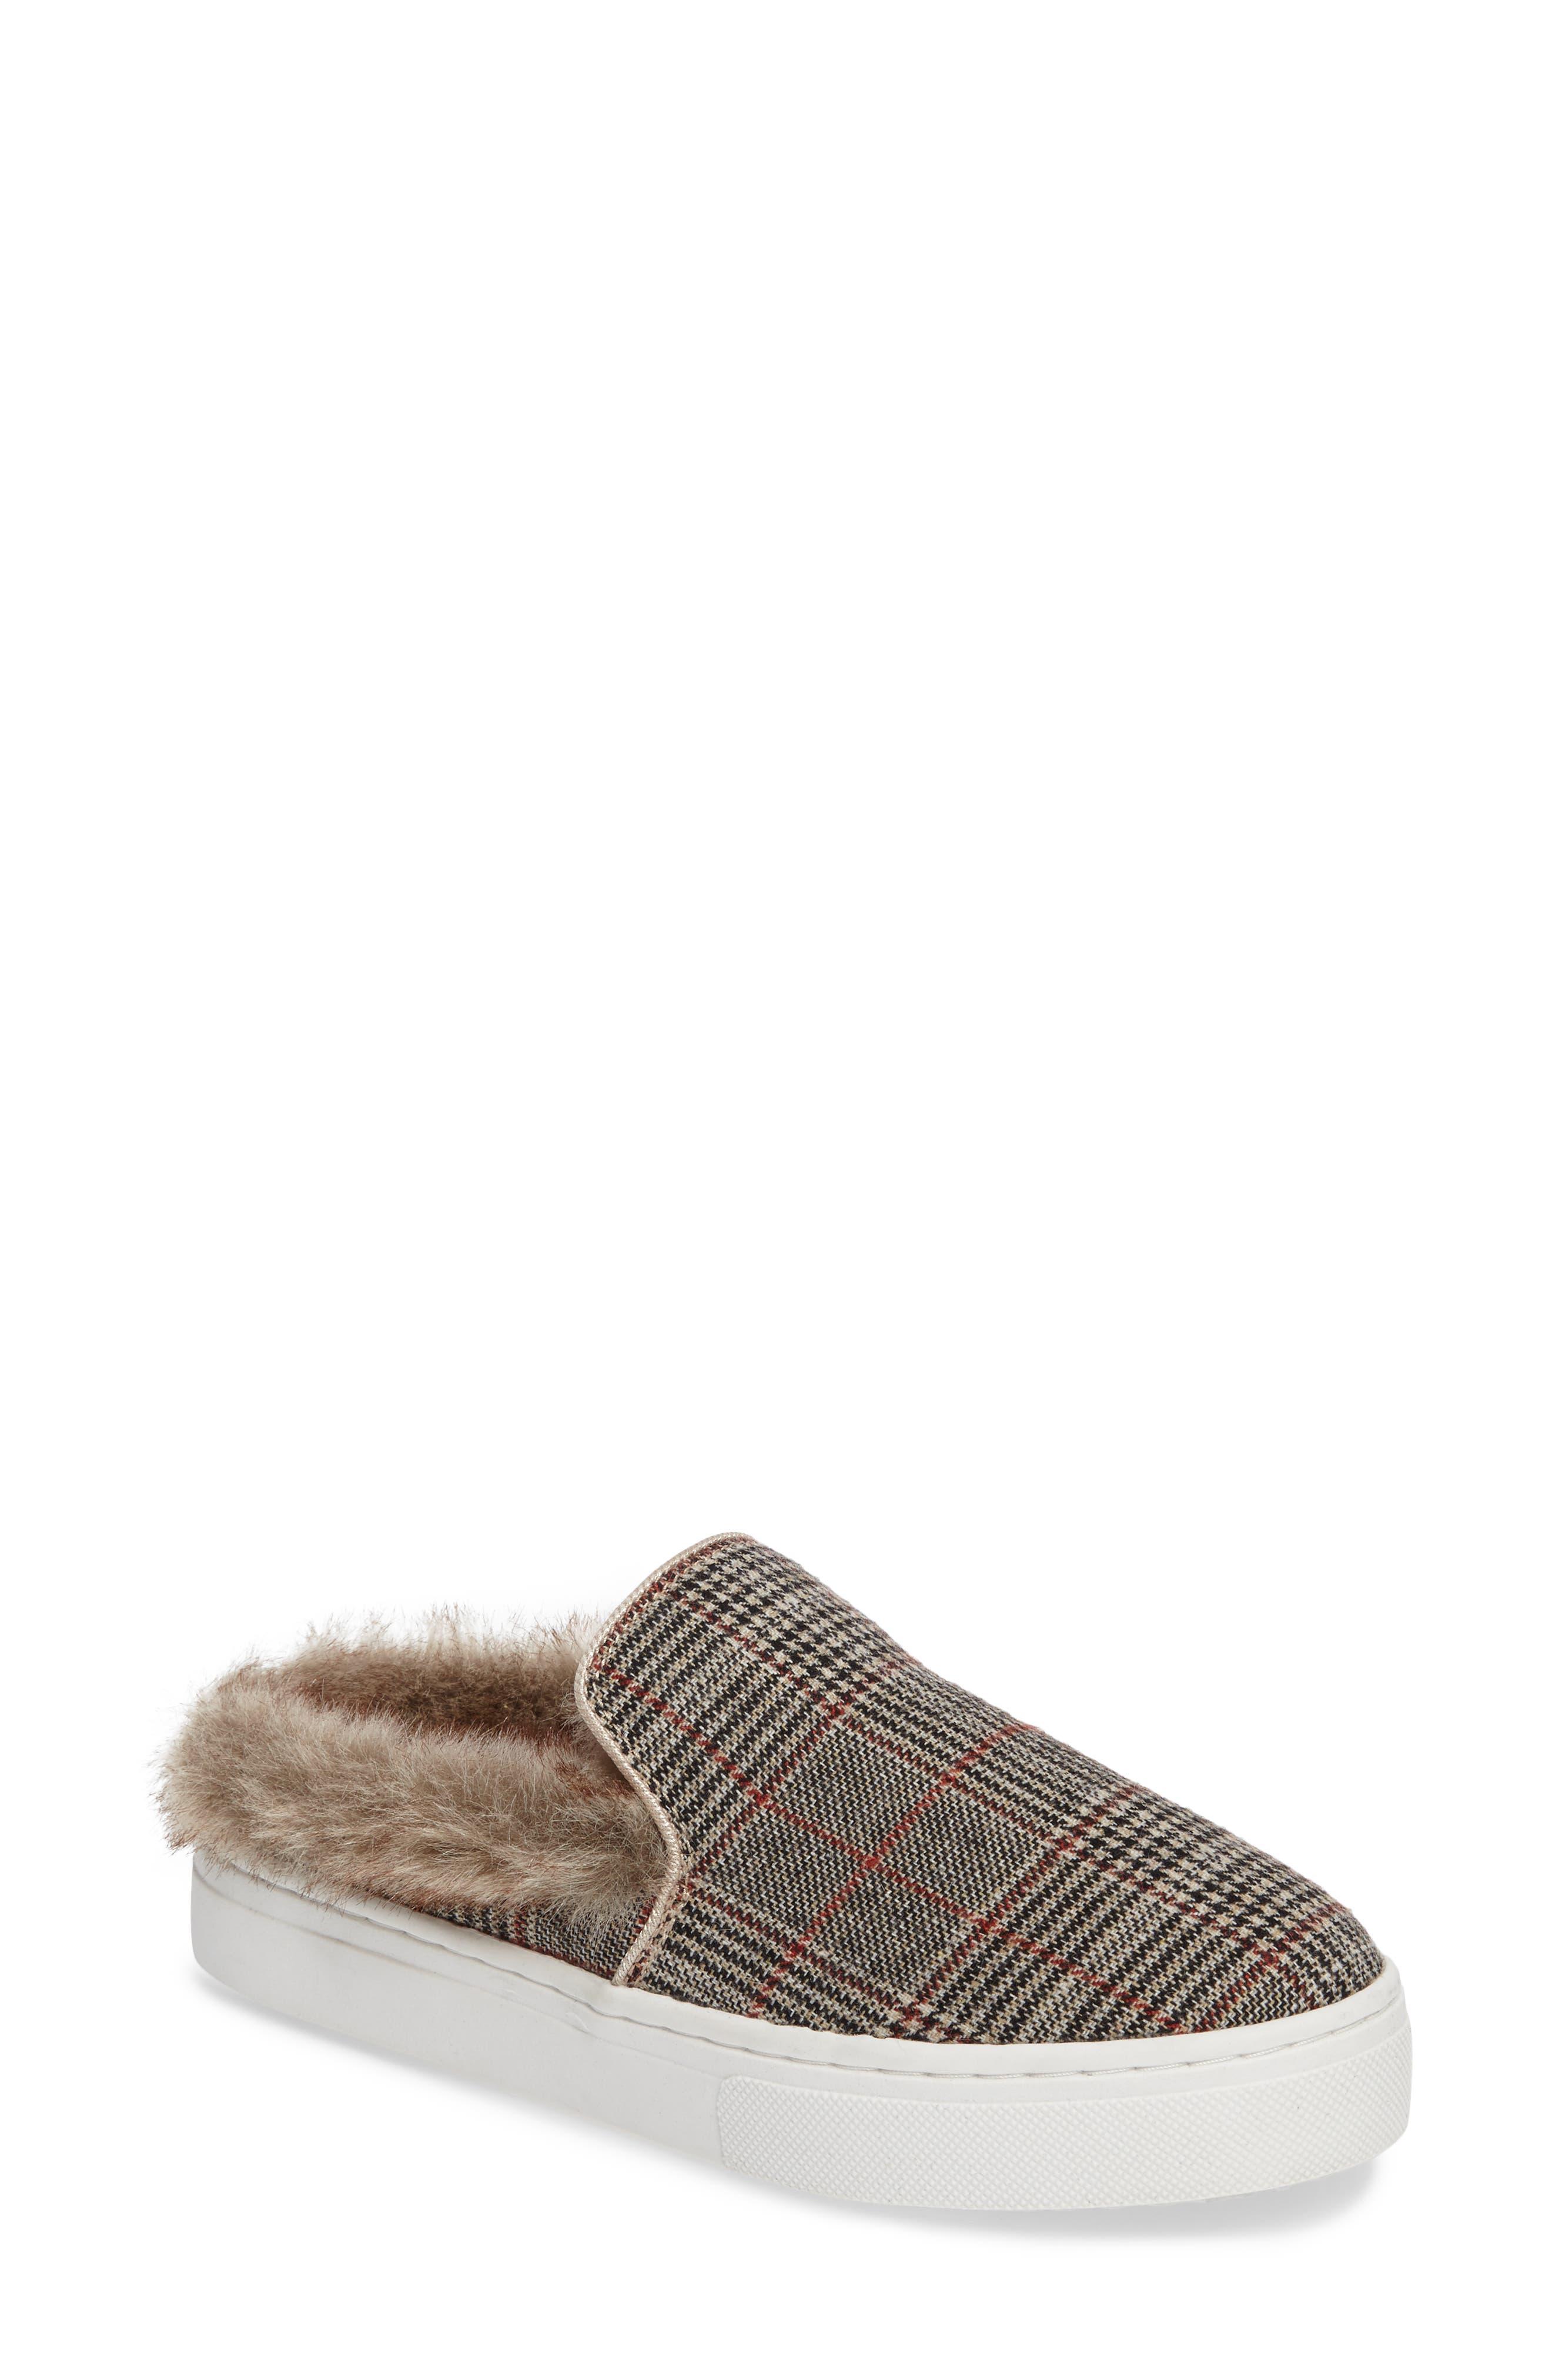 Main Image - Sam Edelman Levonne Platform Sneaker Mule (Women)